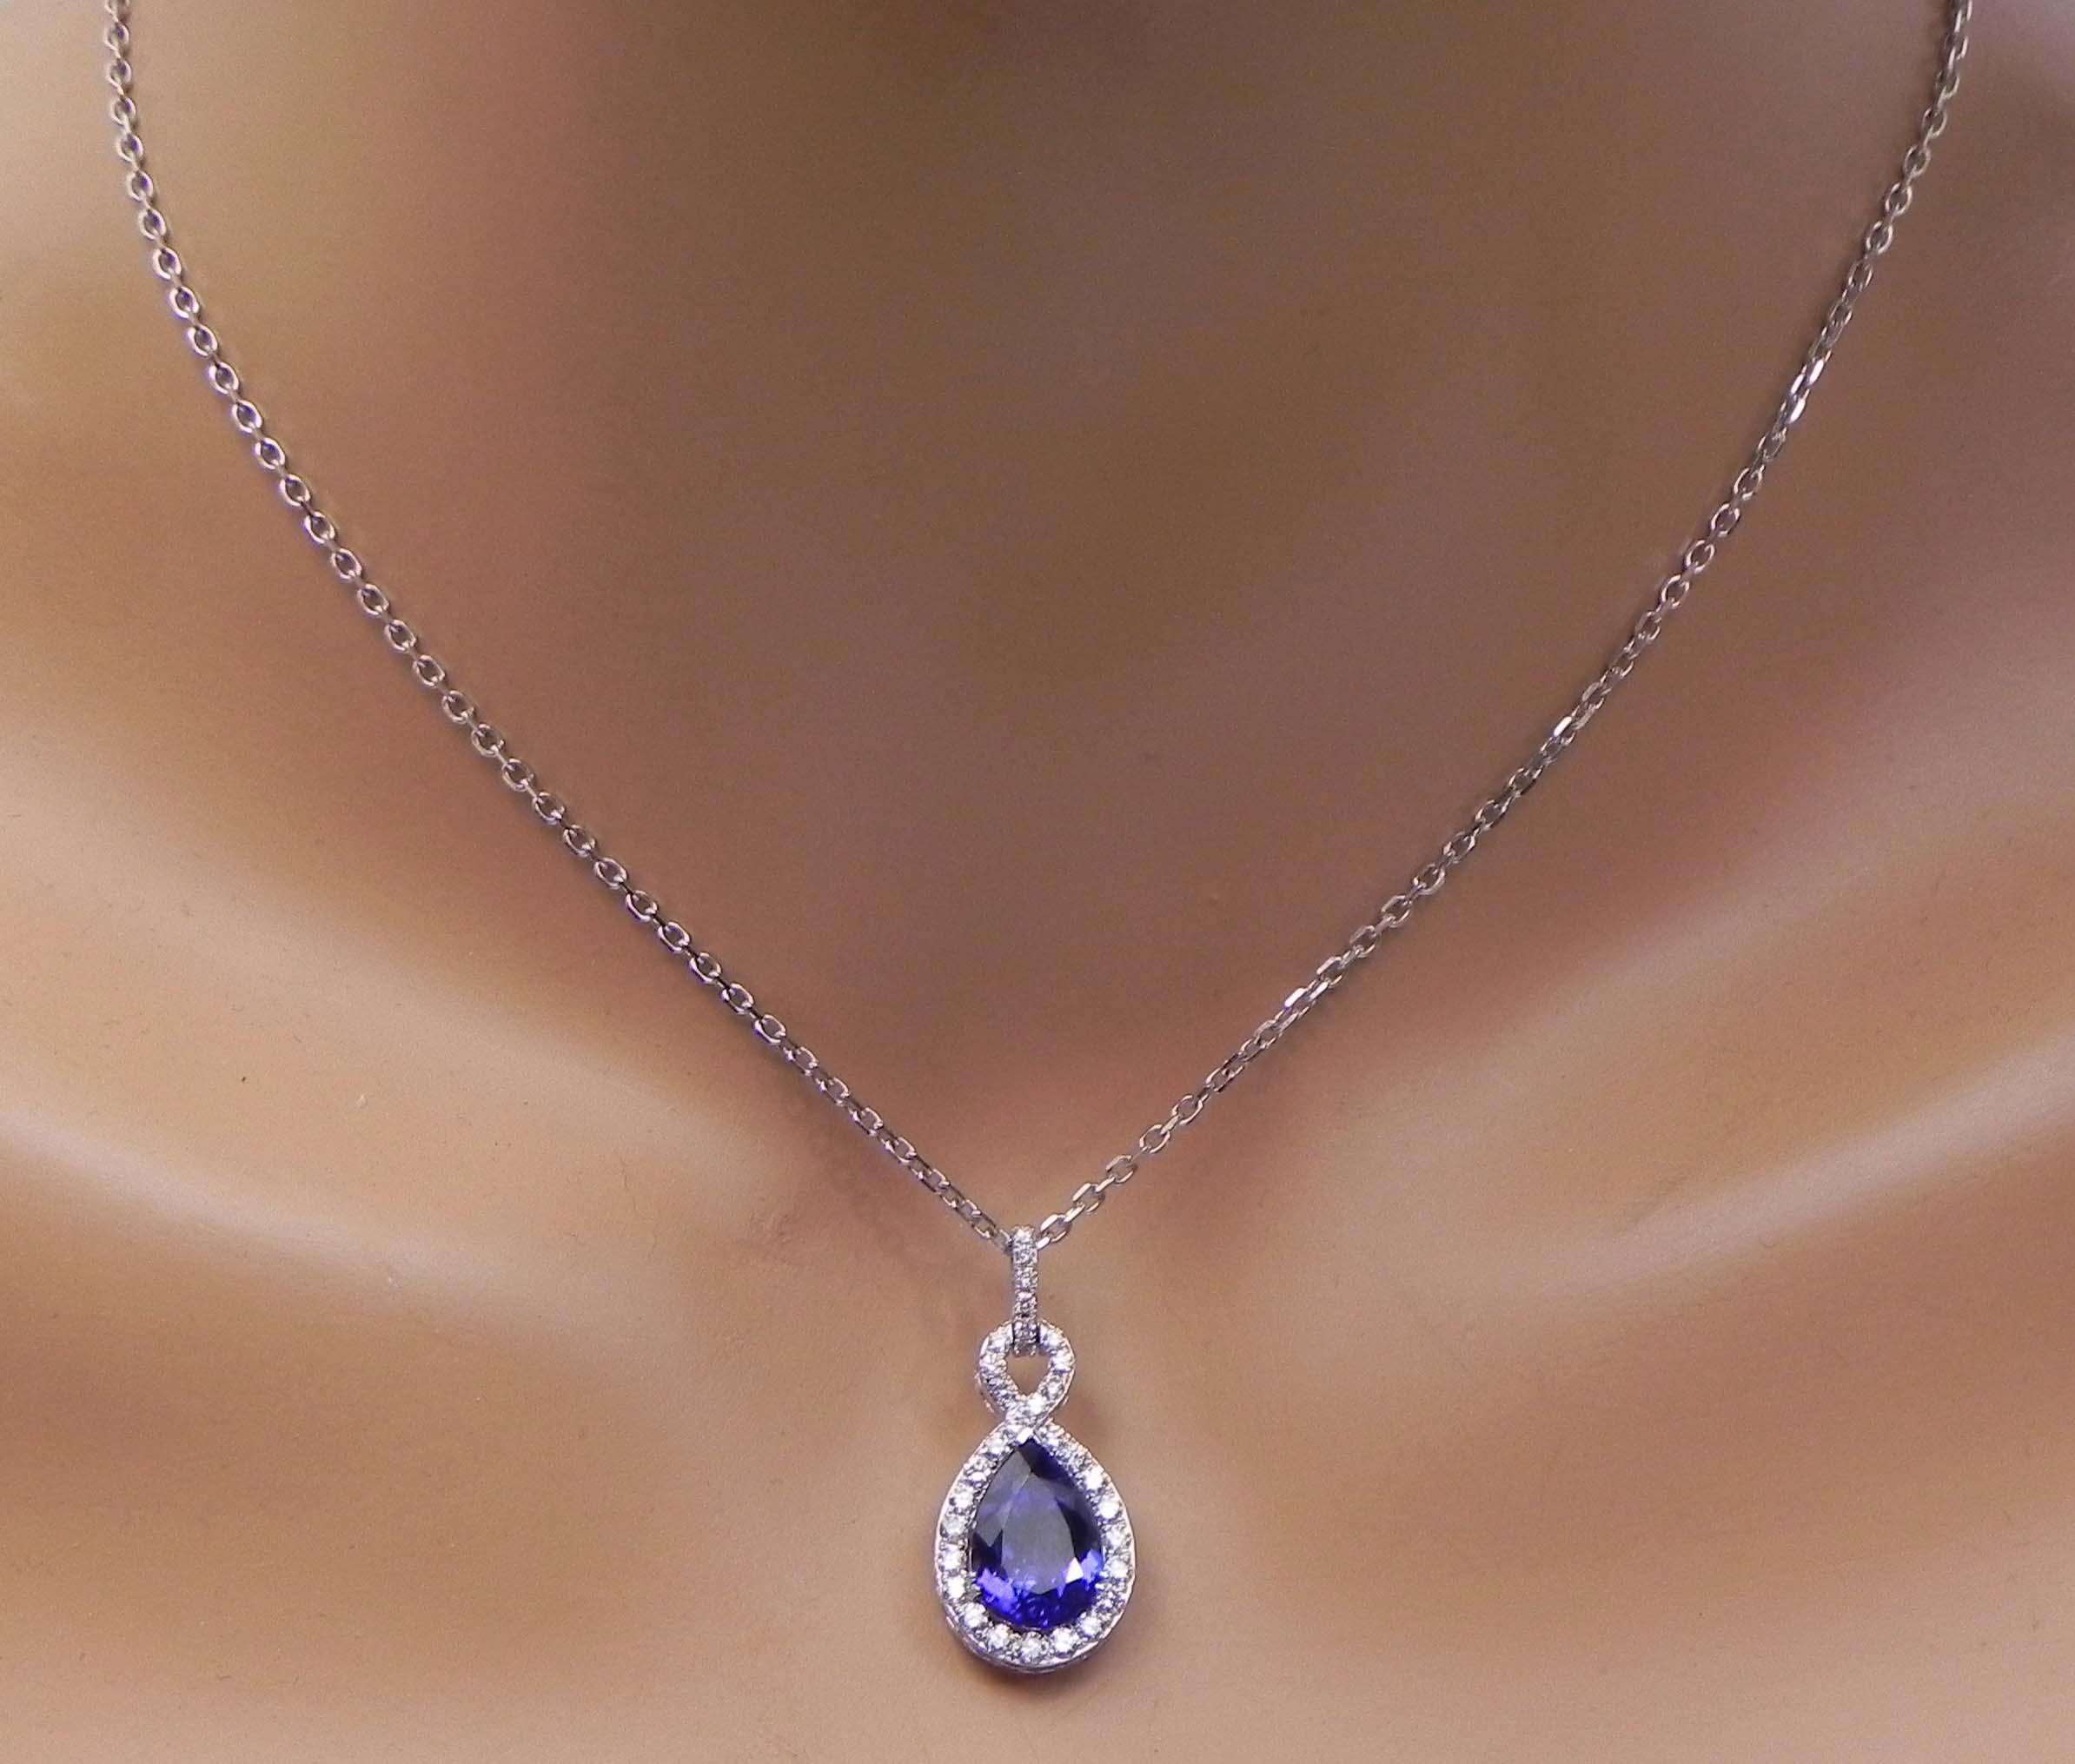 La s 18k White Gold 4 Cts Pear Shaped Tanzanite Diamond Halo